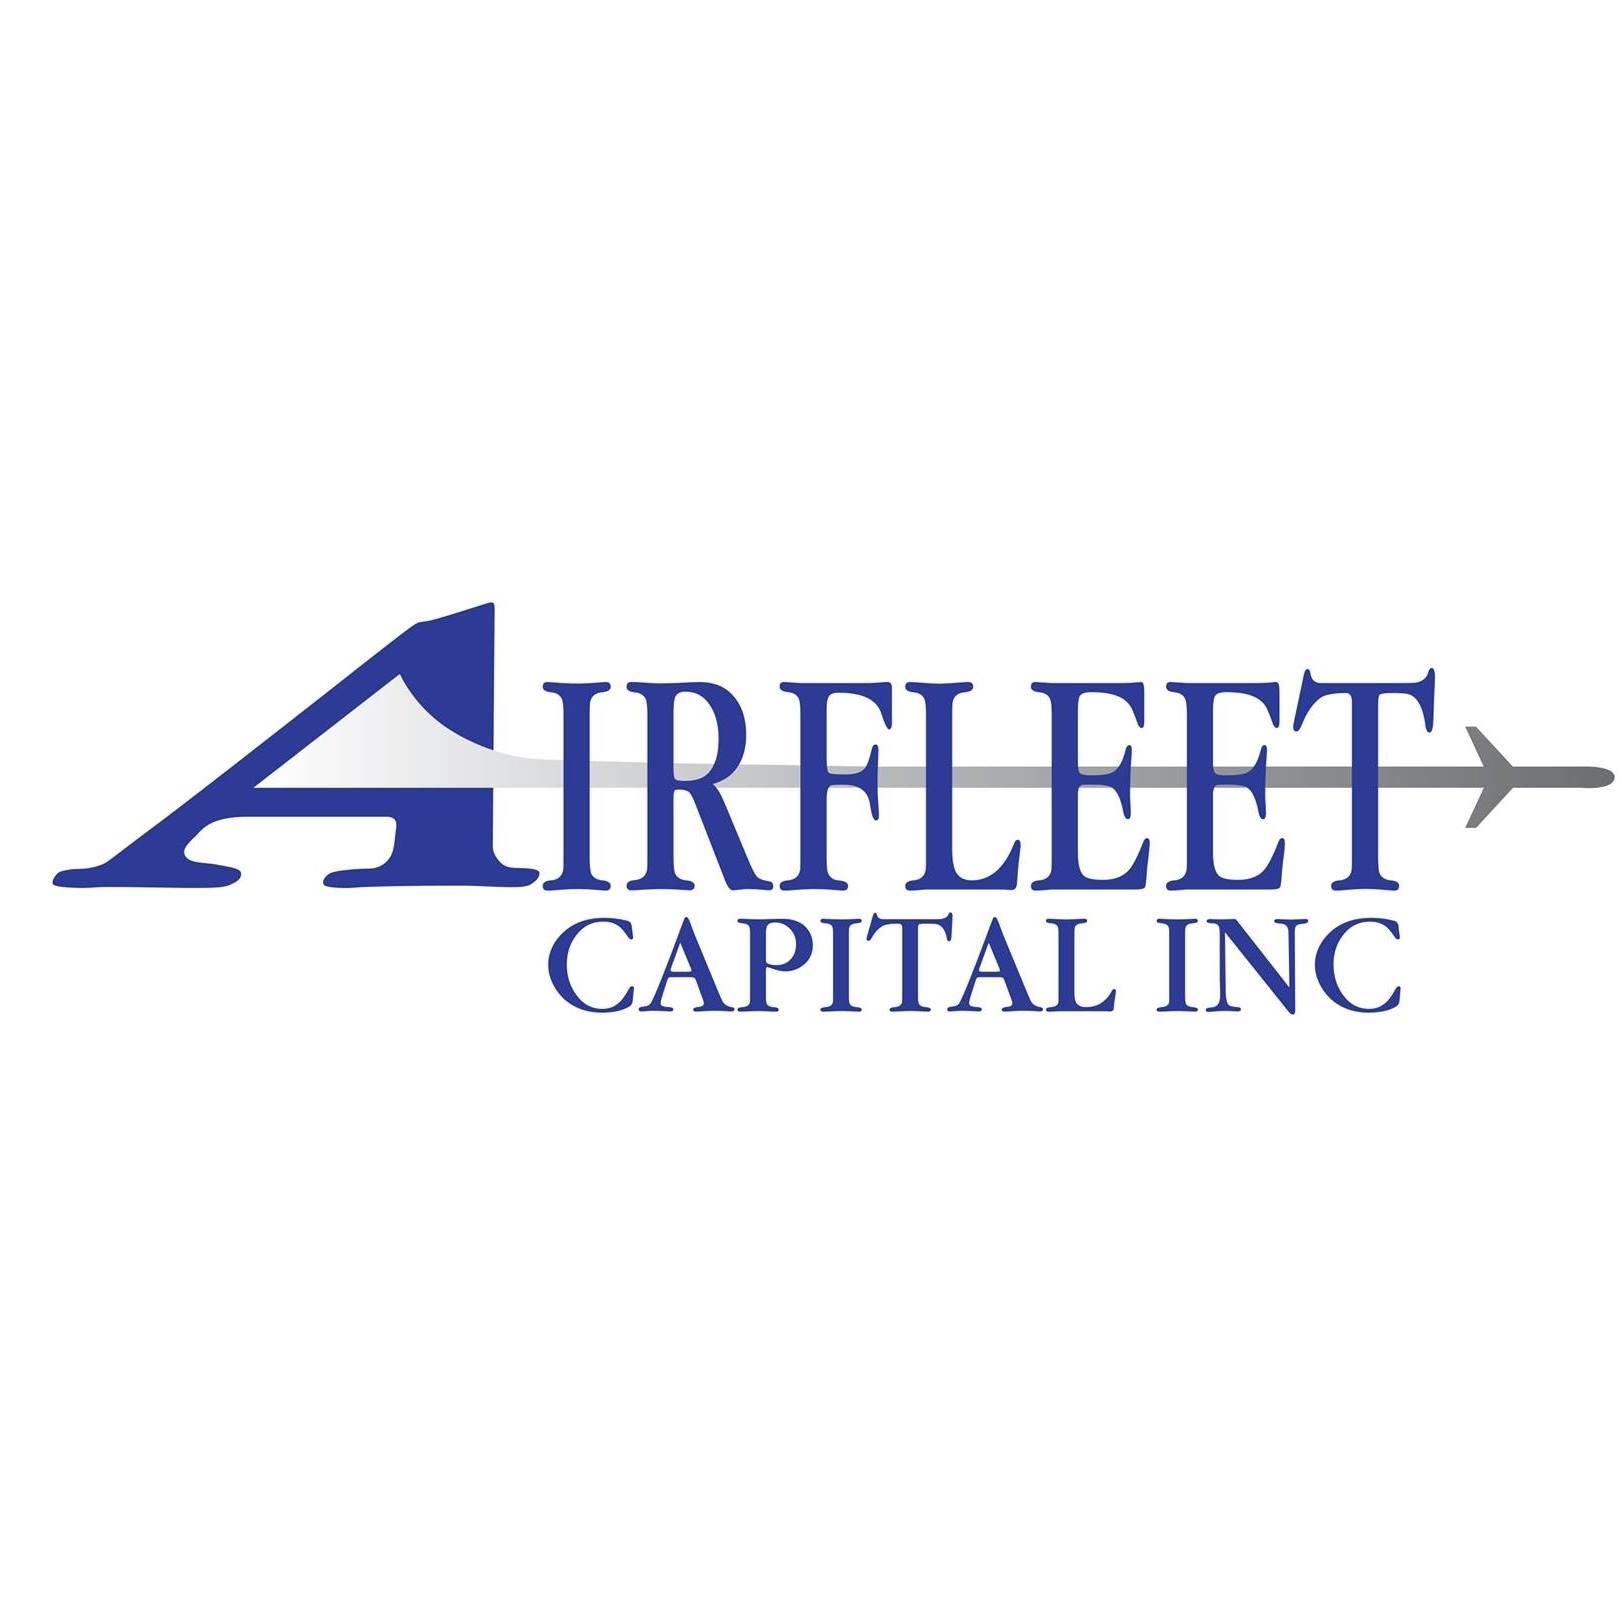 Airfleet Capital Inc.